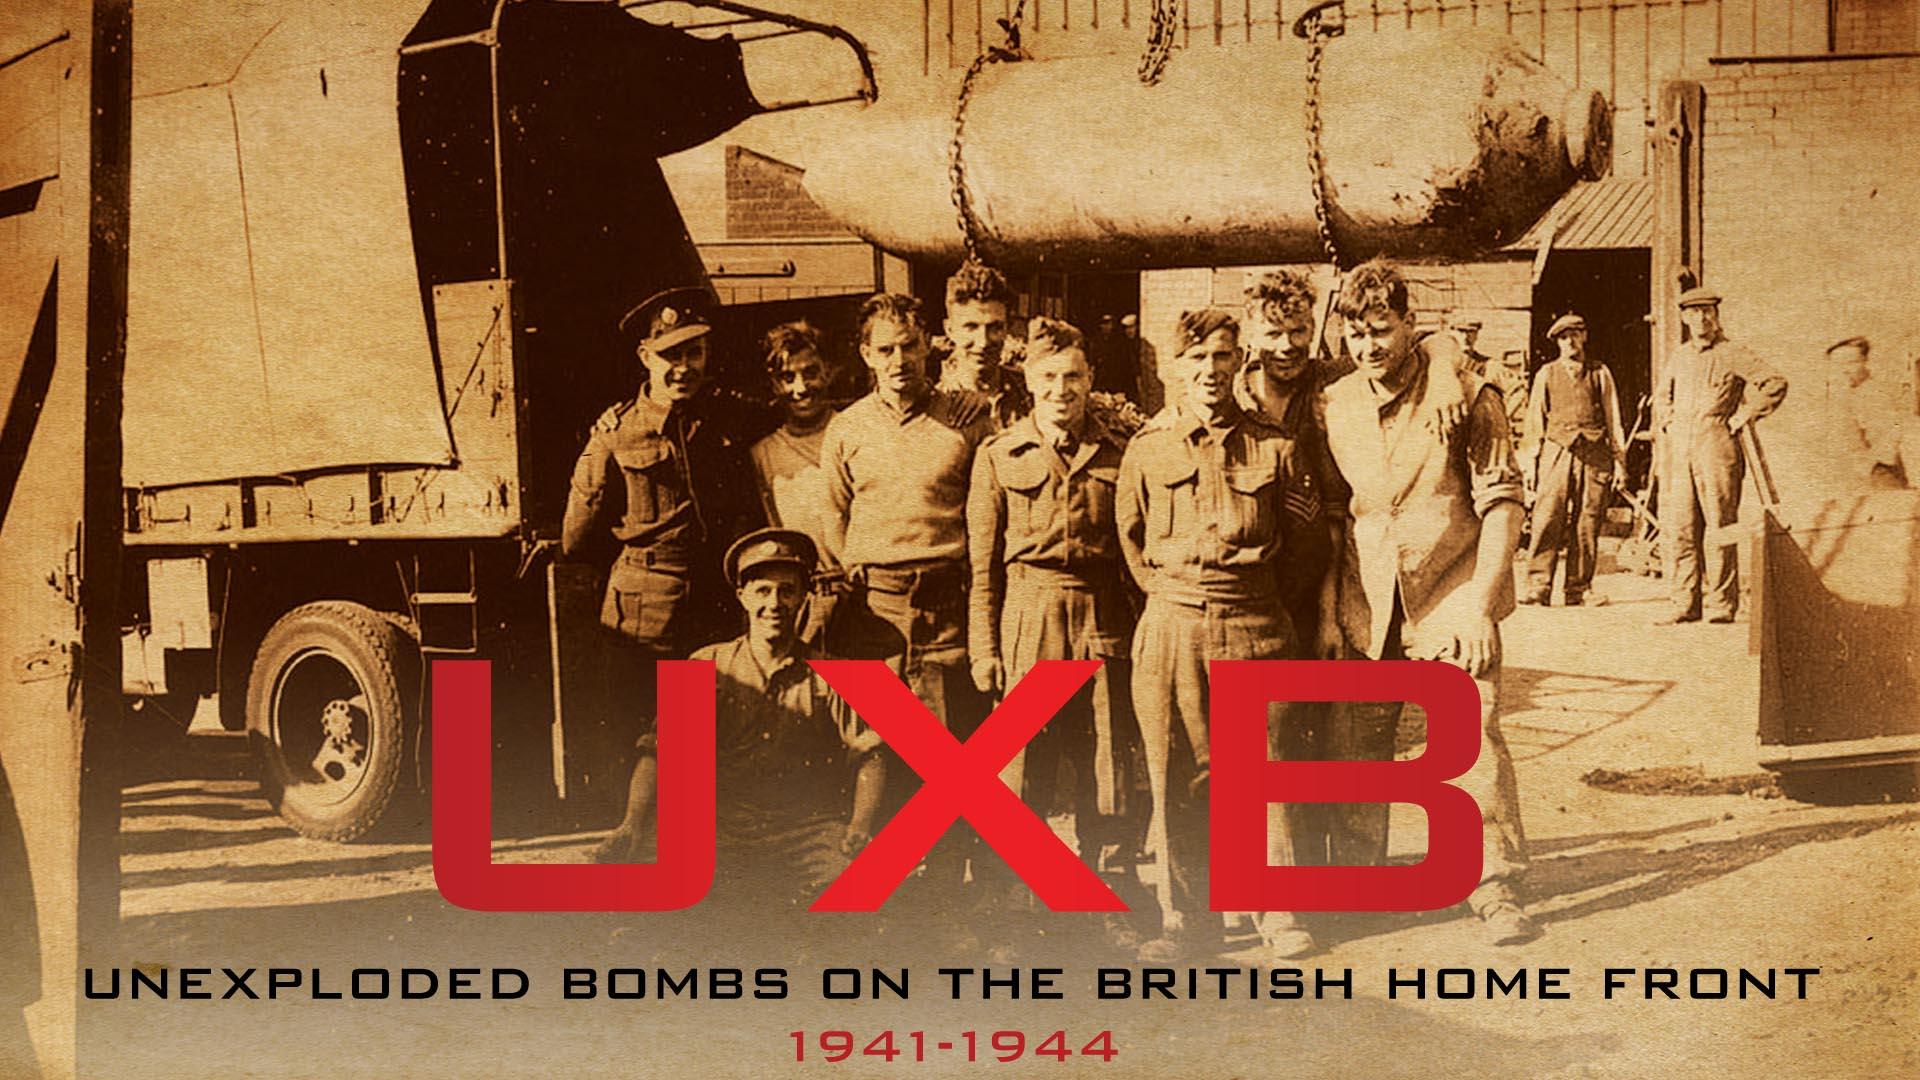 U.X.B. Unexploded Bomb Disposal WWII England -